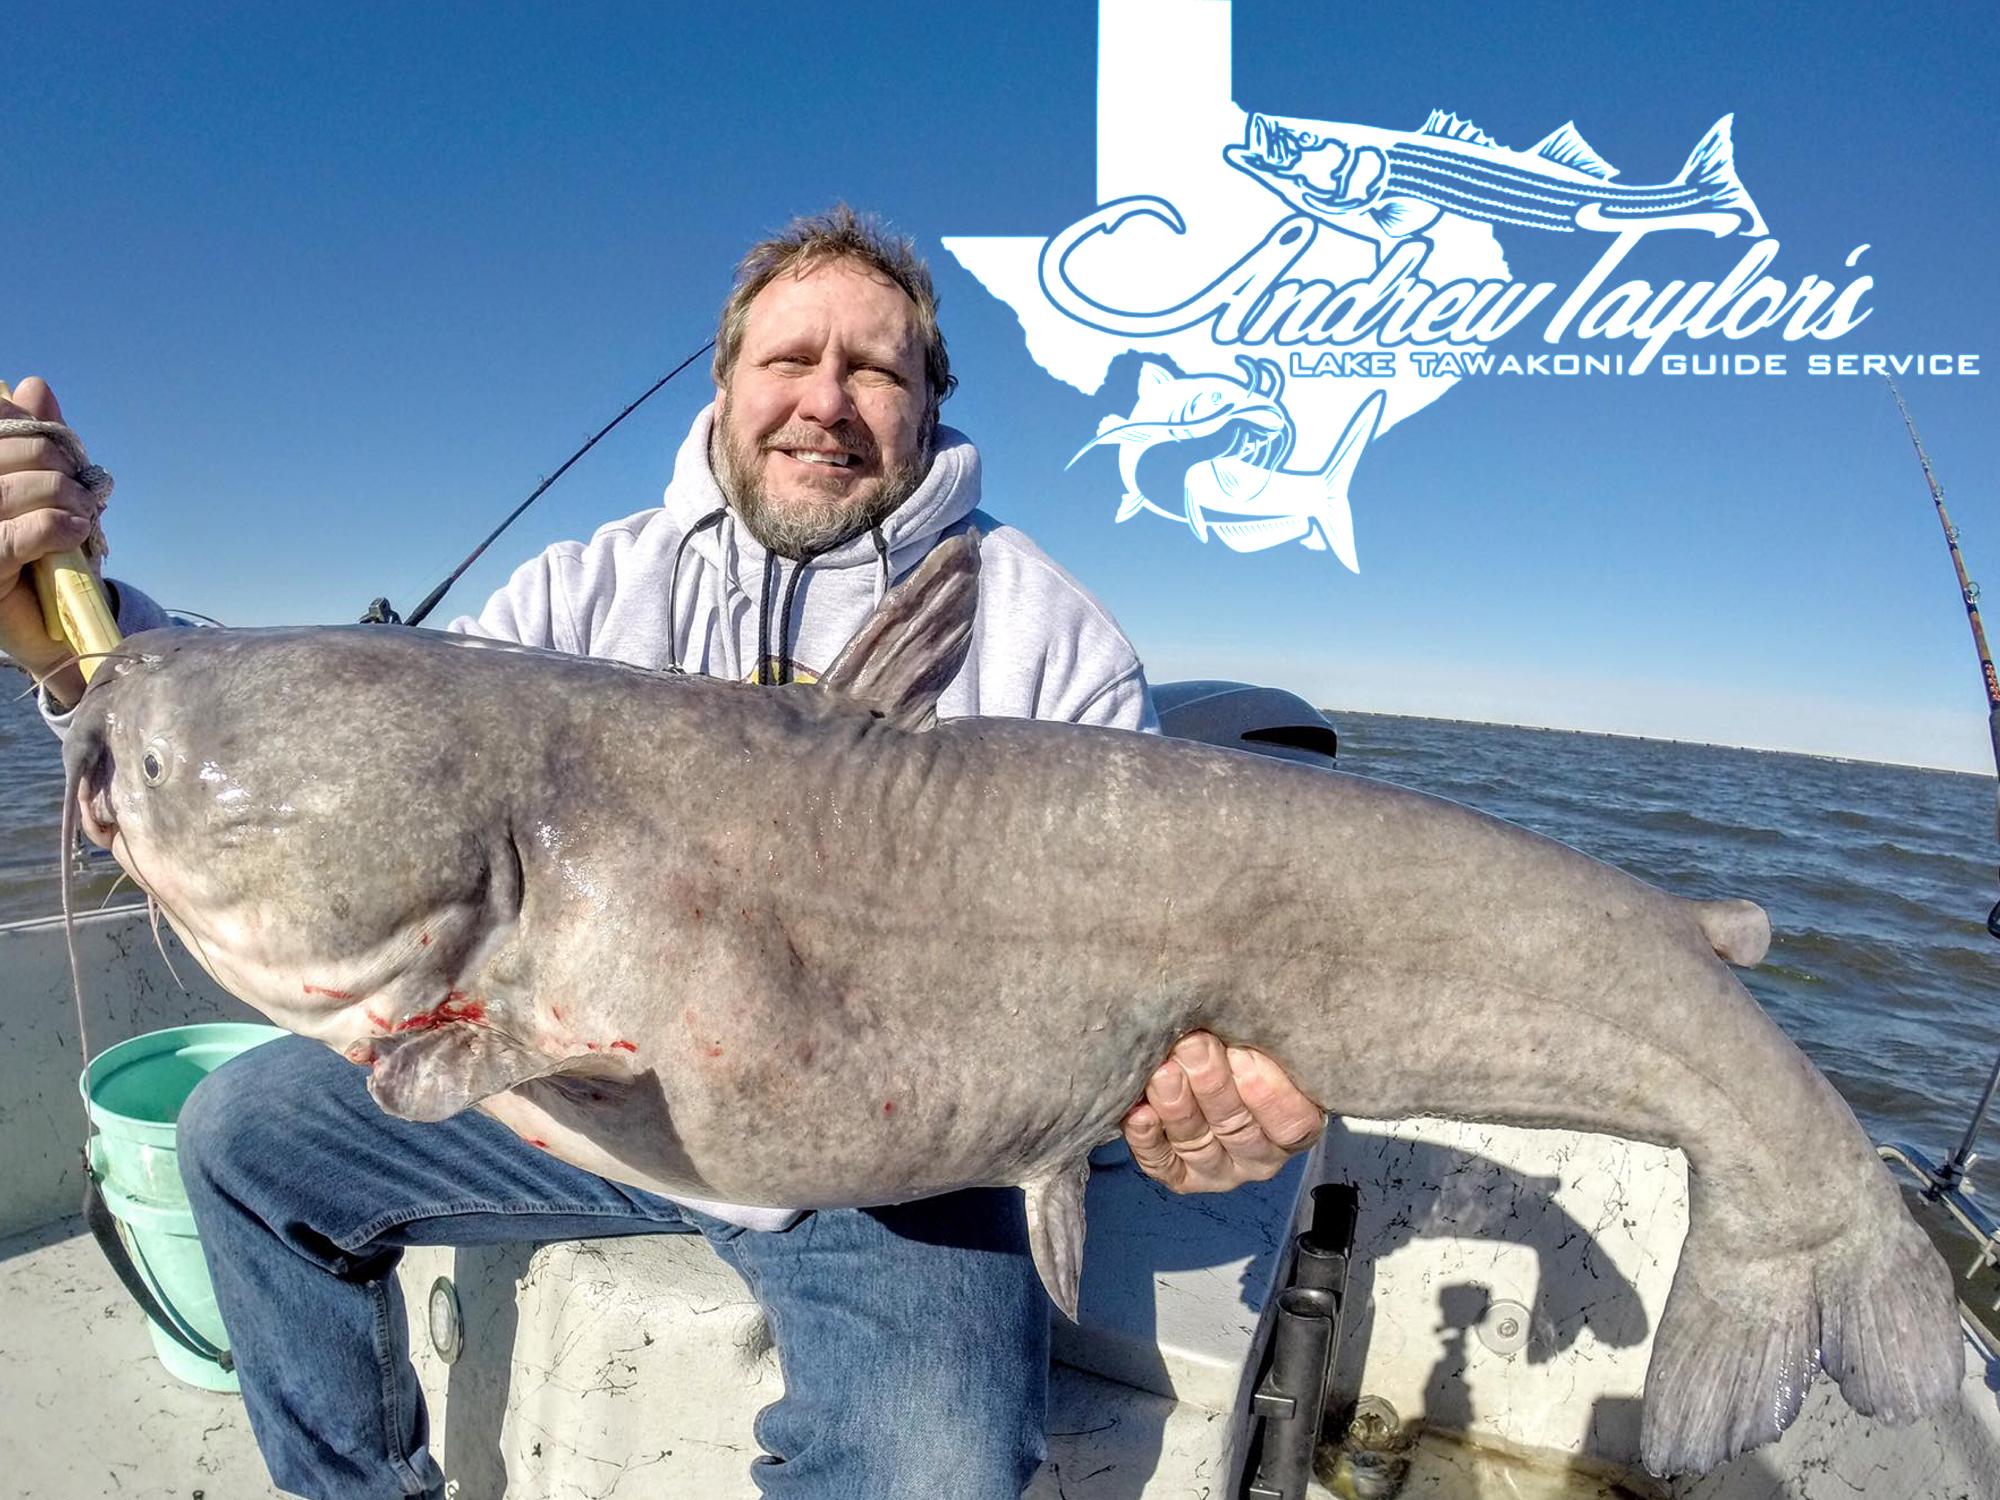 Lake Tawakoni Fishing Guide-Andrew Taylor